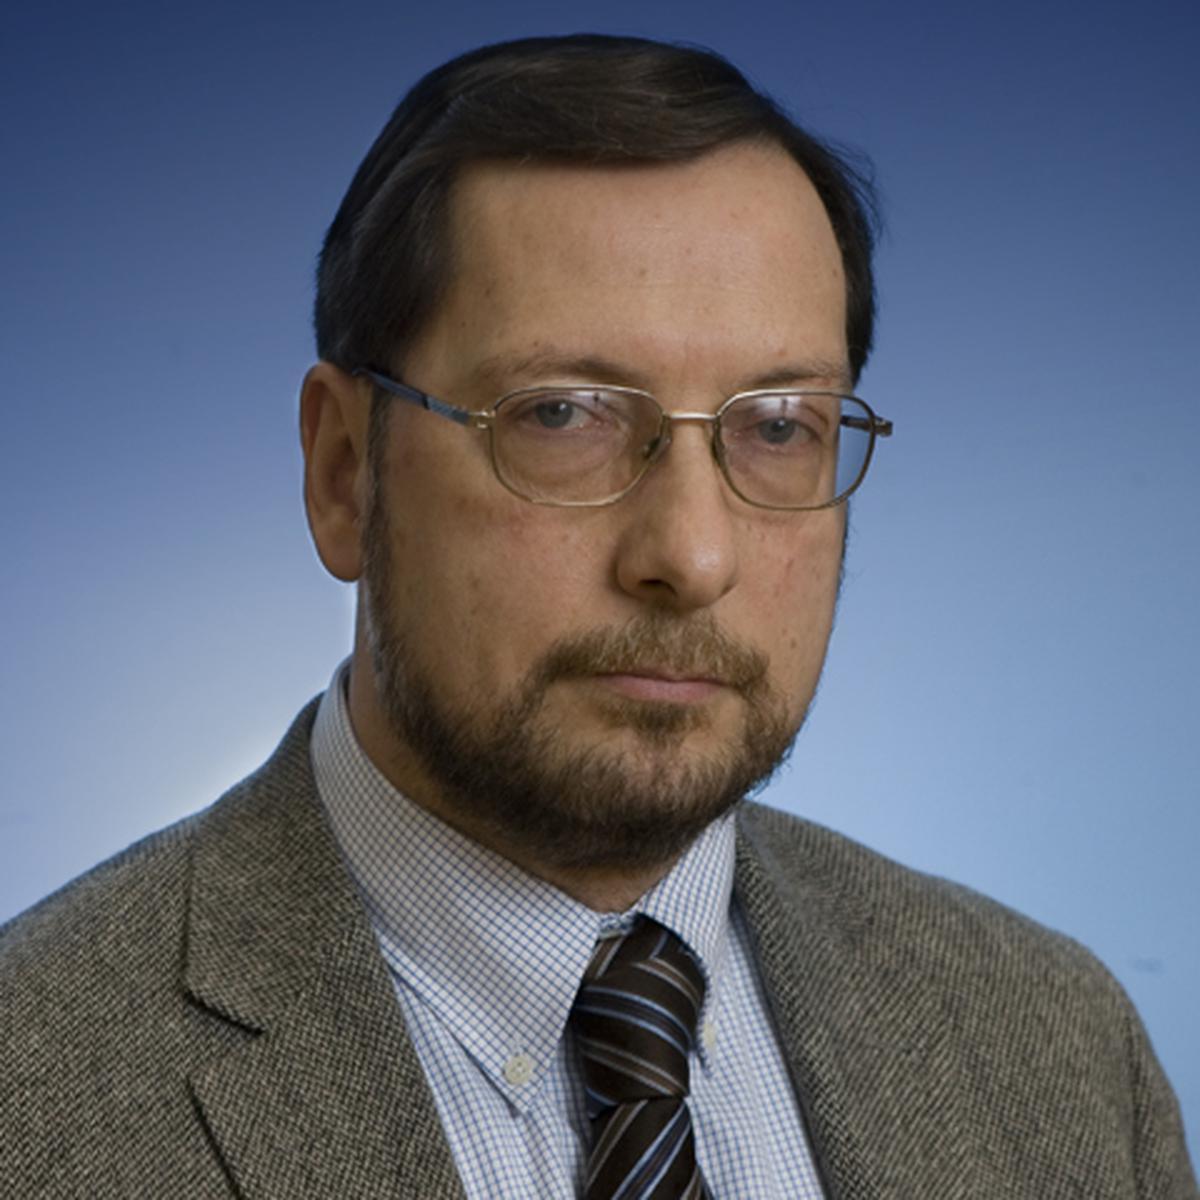 Alexey Arbatov